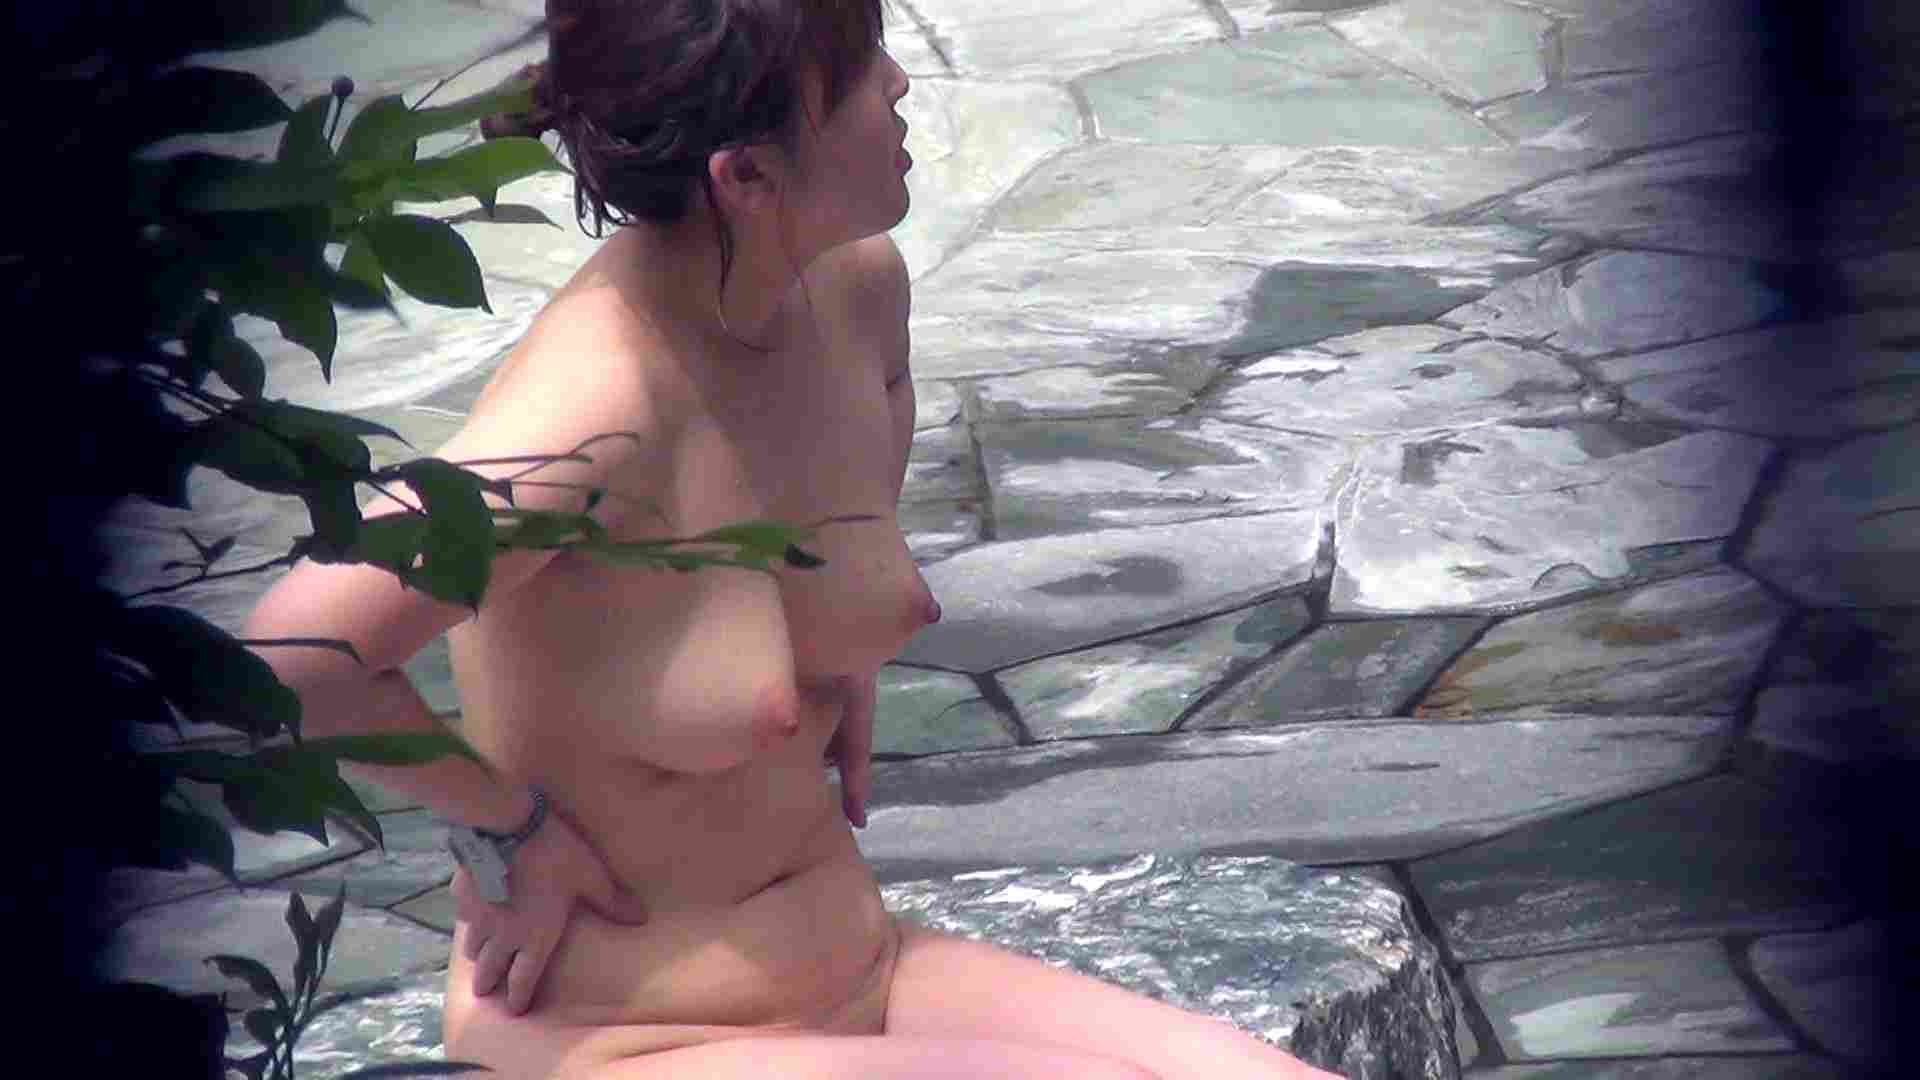 Vol.45 今度はshimaiでしょうか ムッチリ嬢の大胆開脚 潜伏露天風呂 盗撮アダルト動画キャプチャ 99pic 35